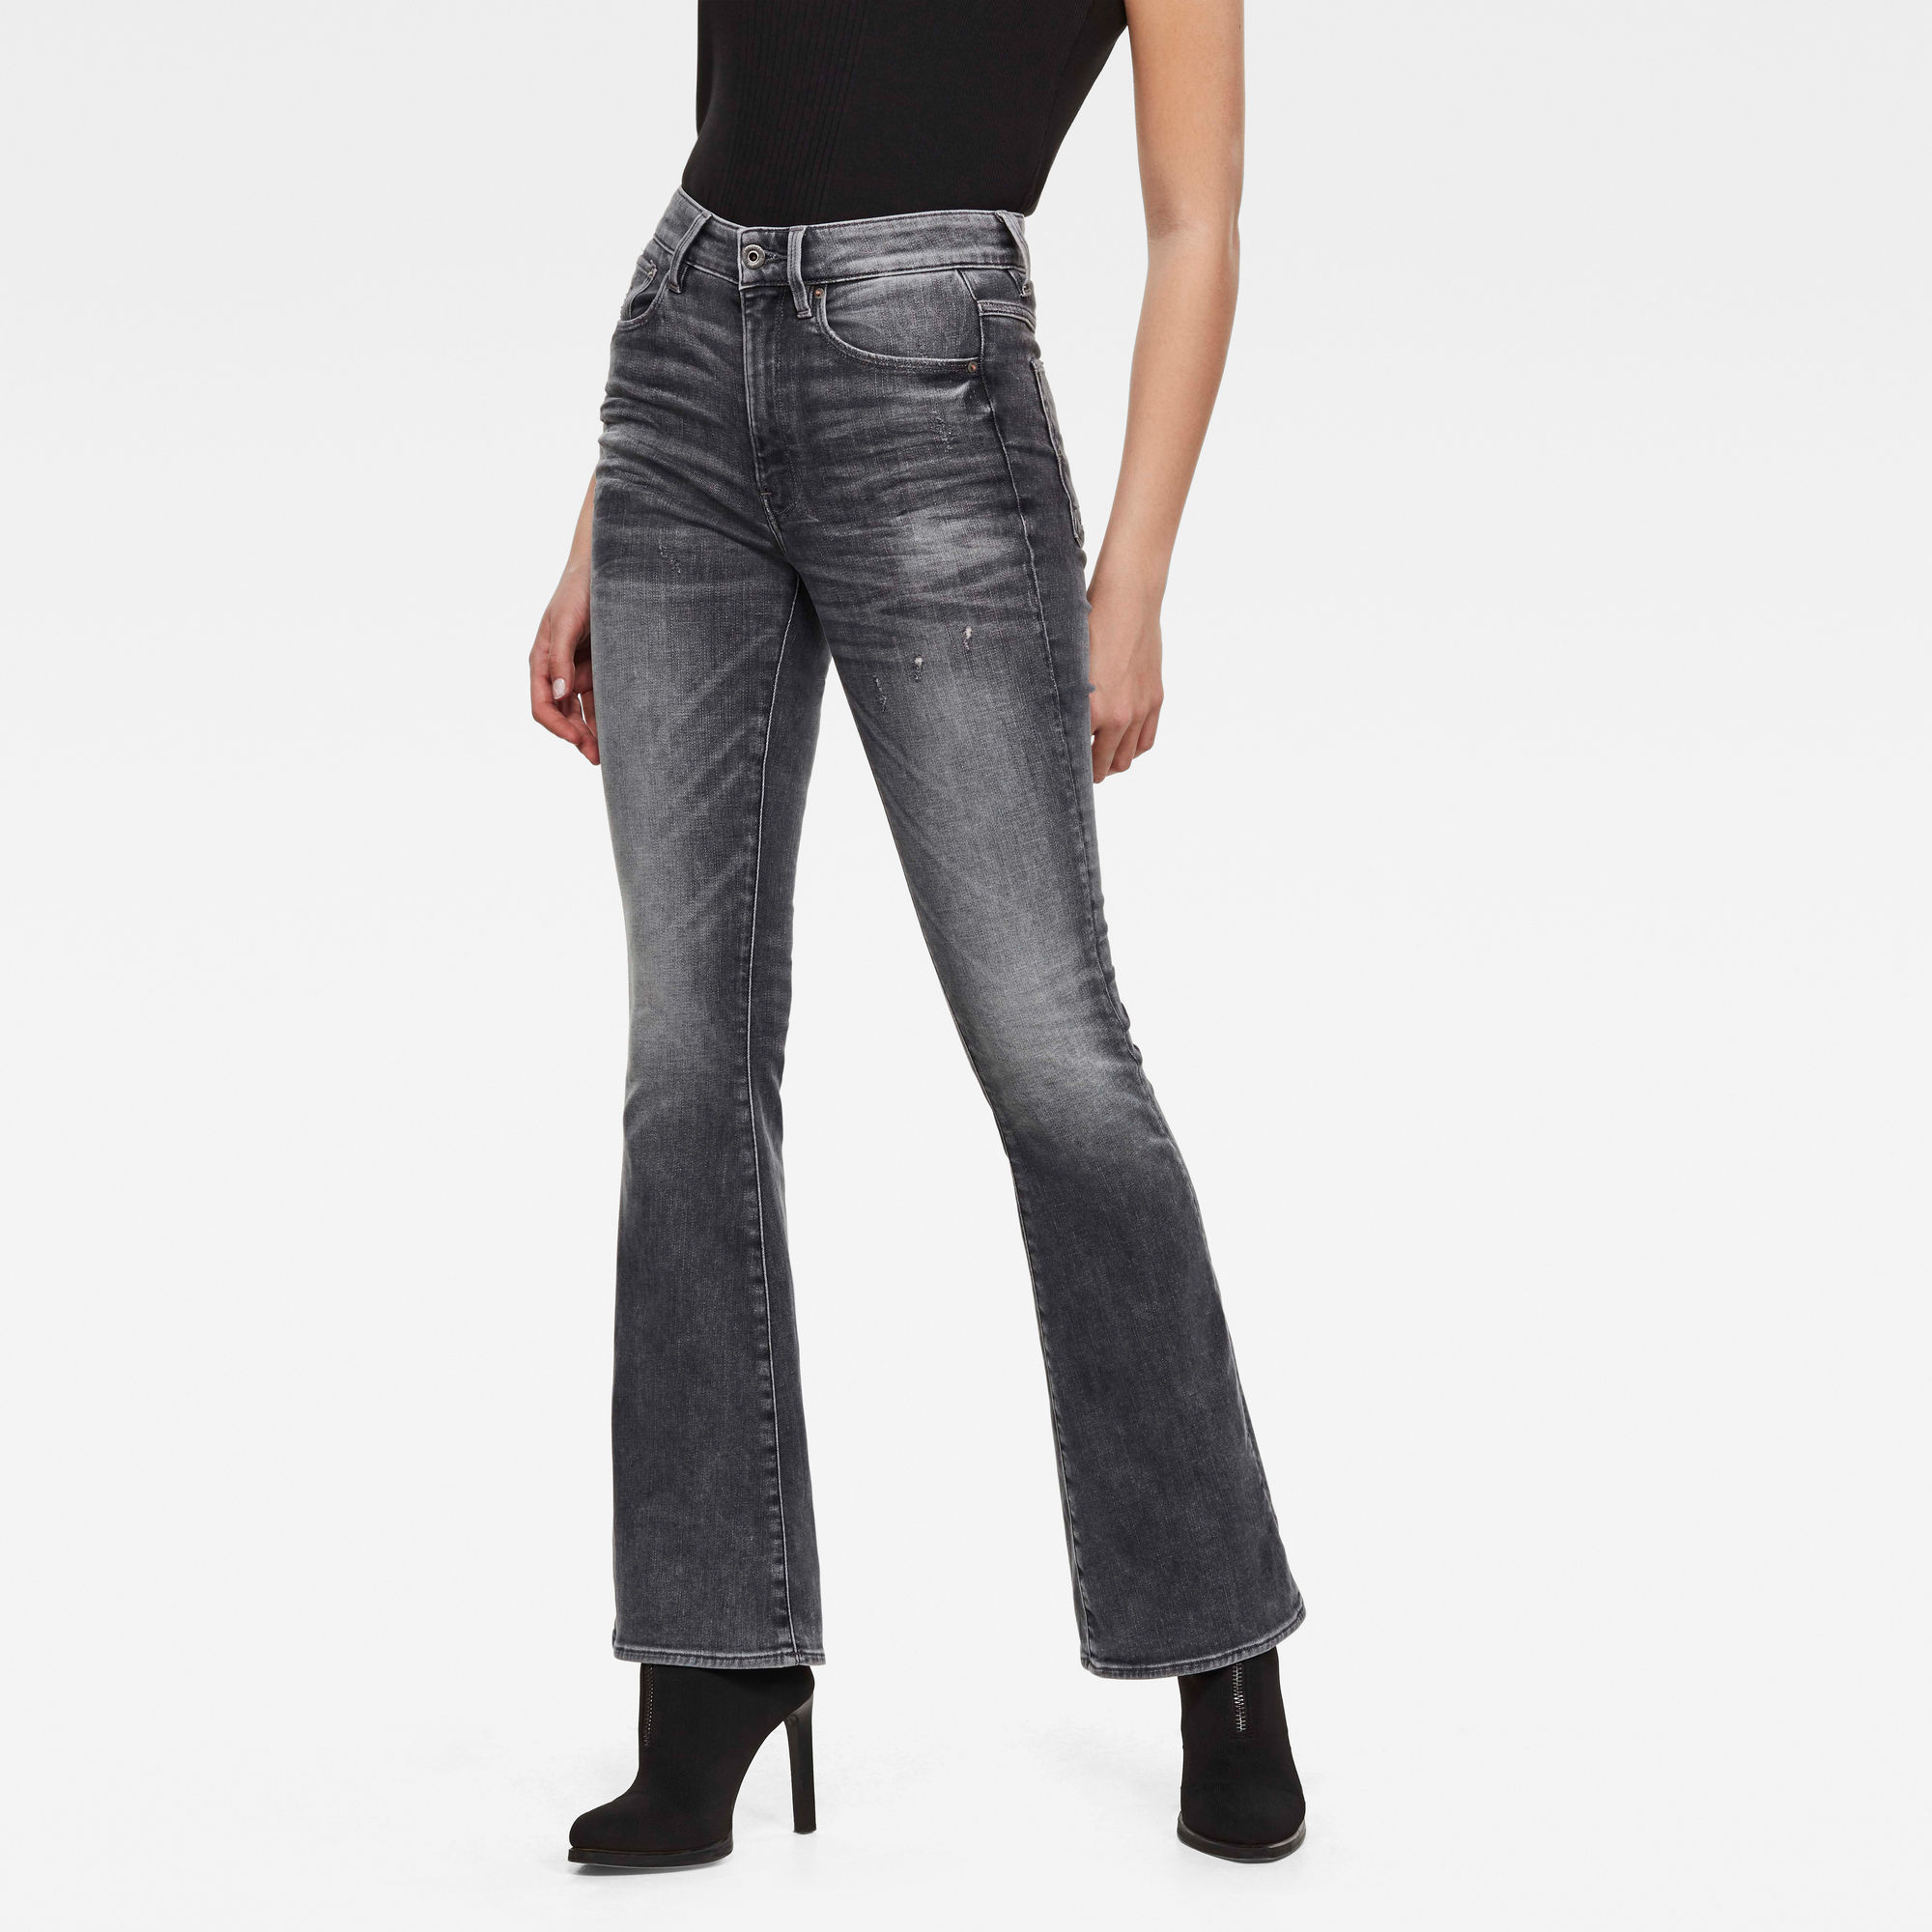 G-Star RAW Dames 3301 High Flare Jeans Zwart